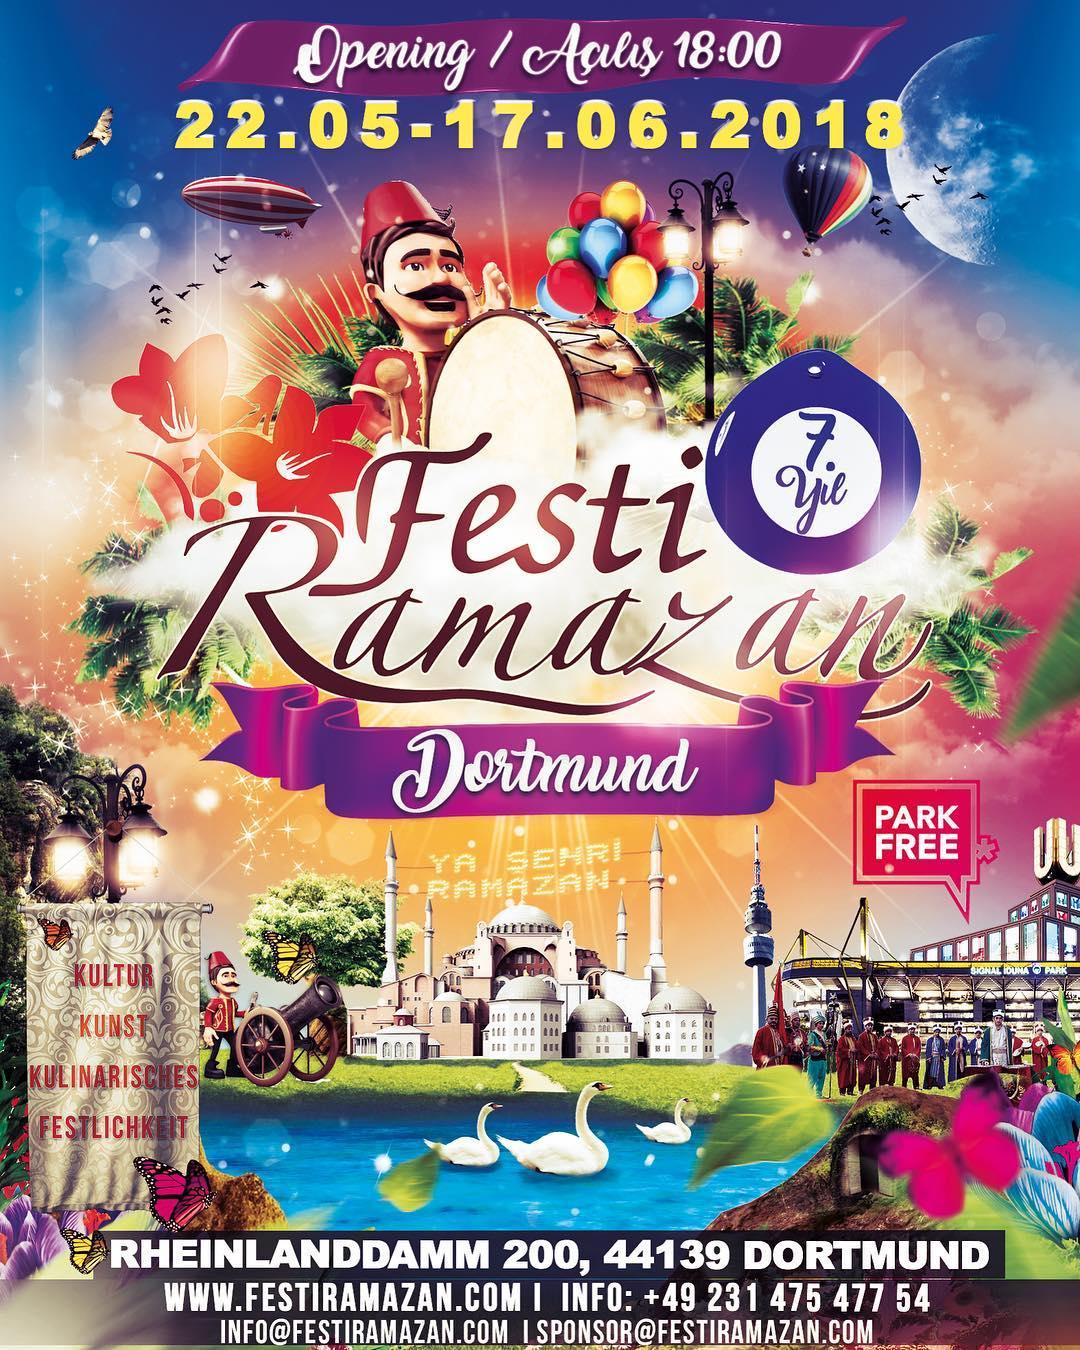 Festi Ramazan Almanya Avrupa Dortmund Deutschland